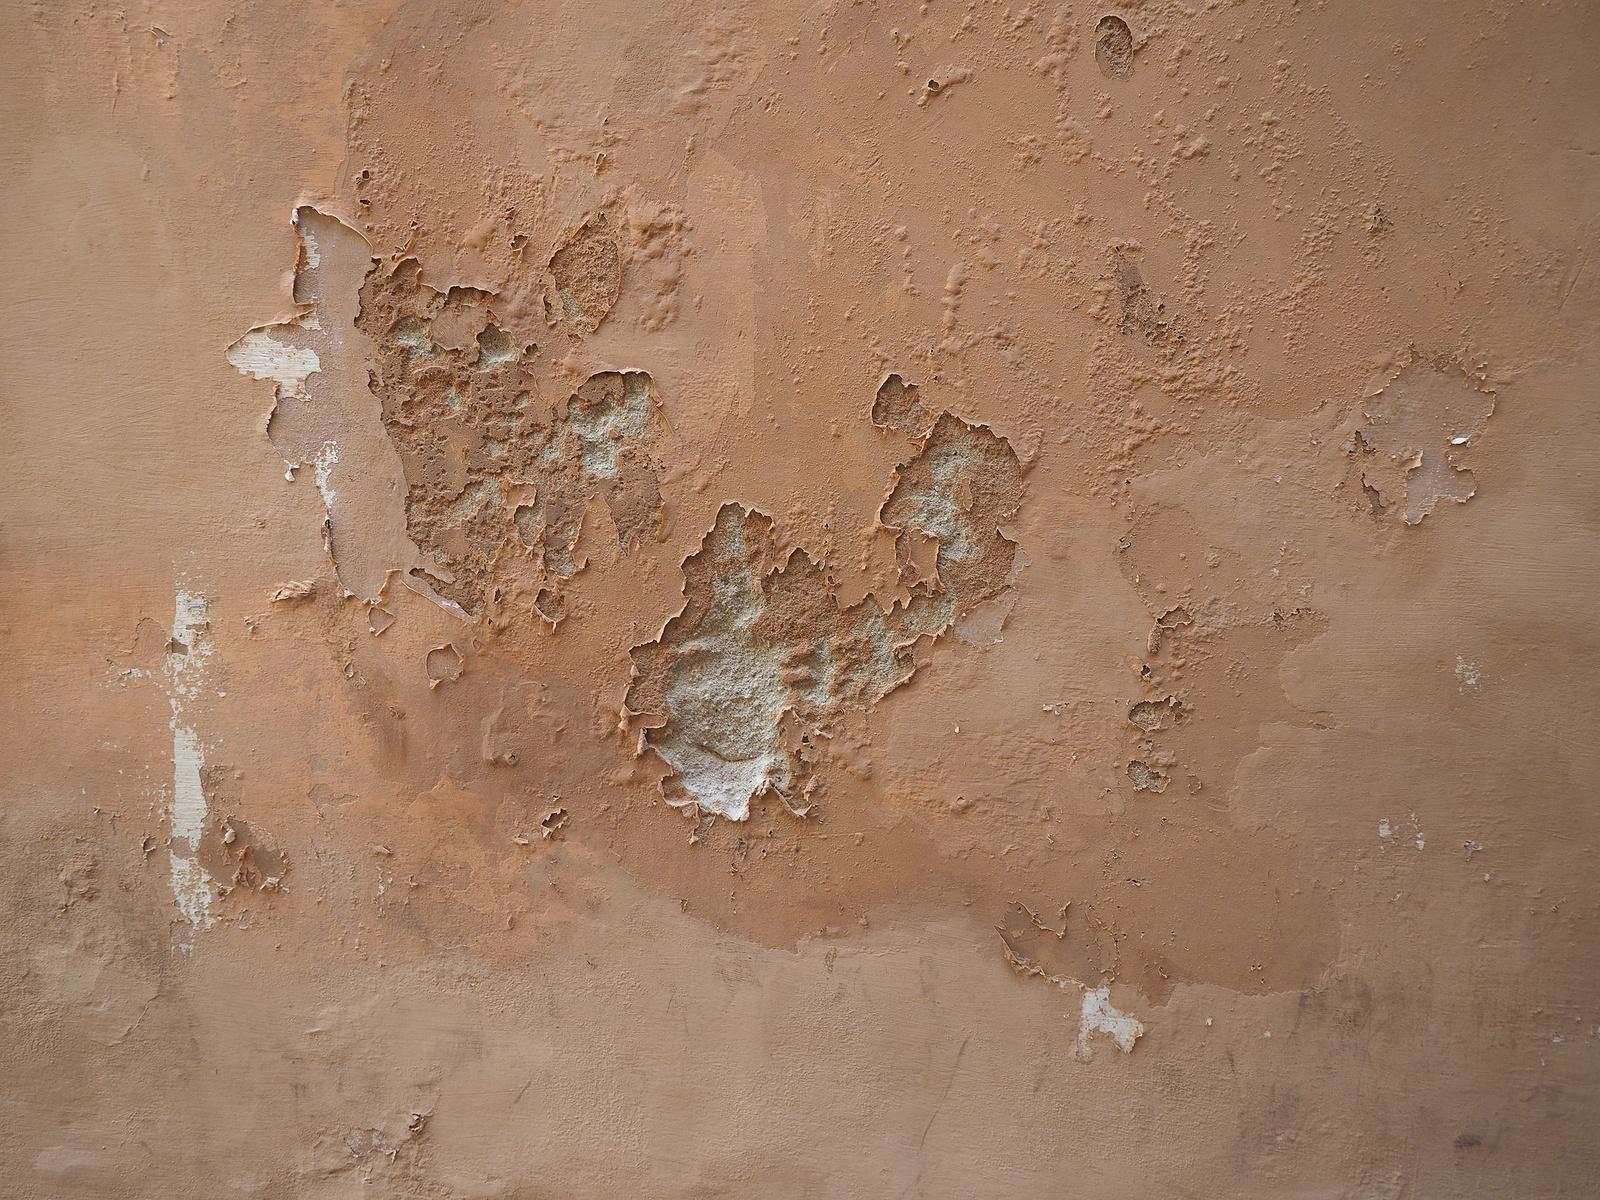 water-damage-interior-walls.jpg